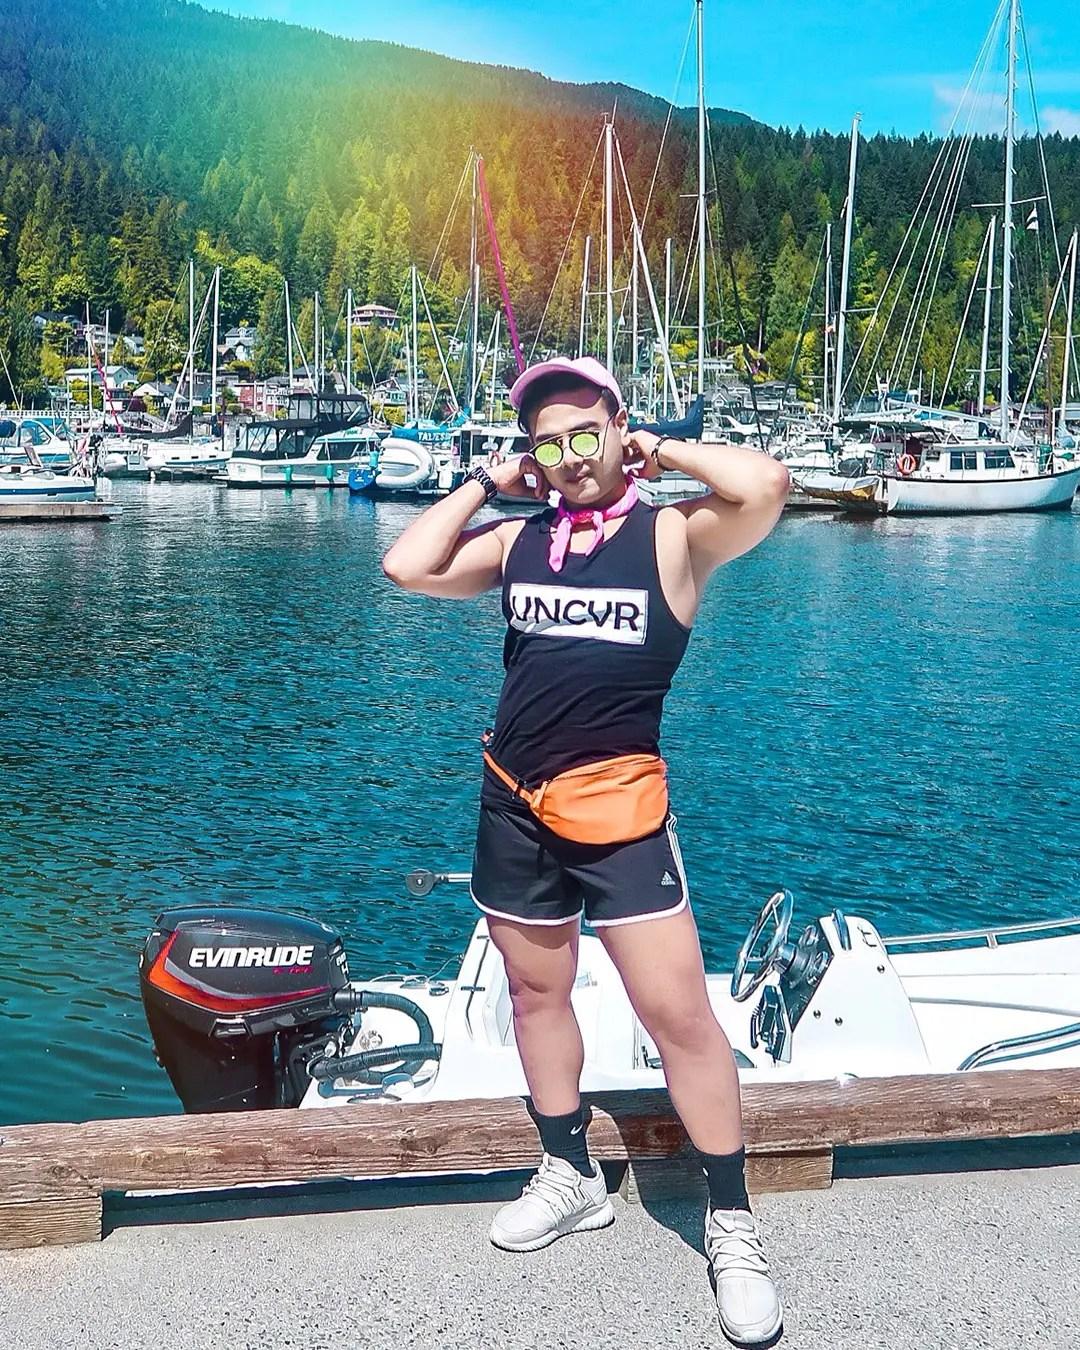 Festival Fashion Visiting Vancouver Jonathan Waiching Ho_Travel Blogger Influencer_Summer fashion men Canada Social Media Influencer_Adidas Shorts Summer Tank Vacay Style Beach Wear_Toronto Influencer Top Canada